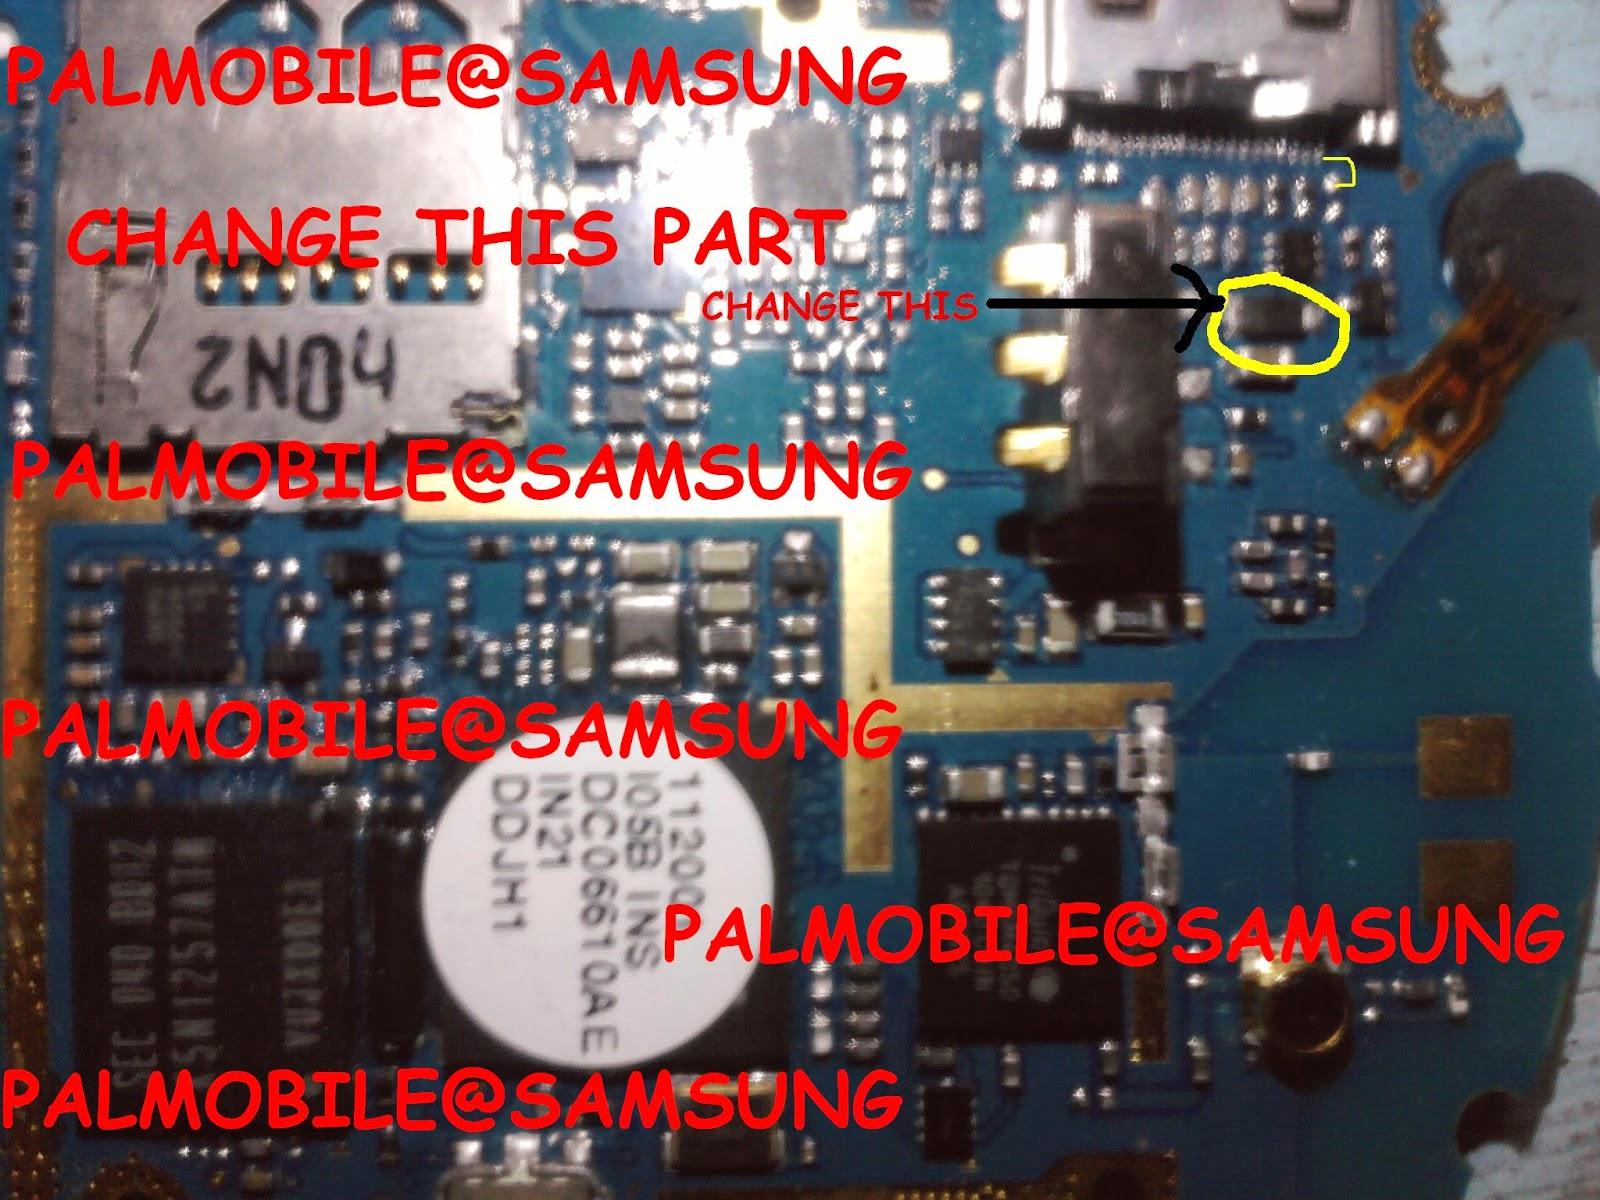 E2152 auto charging solution